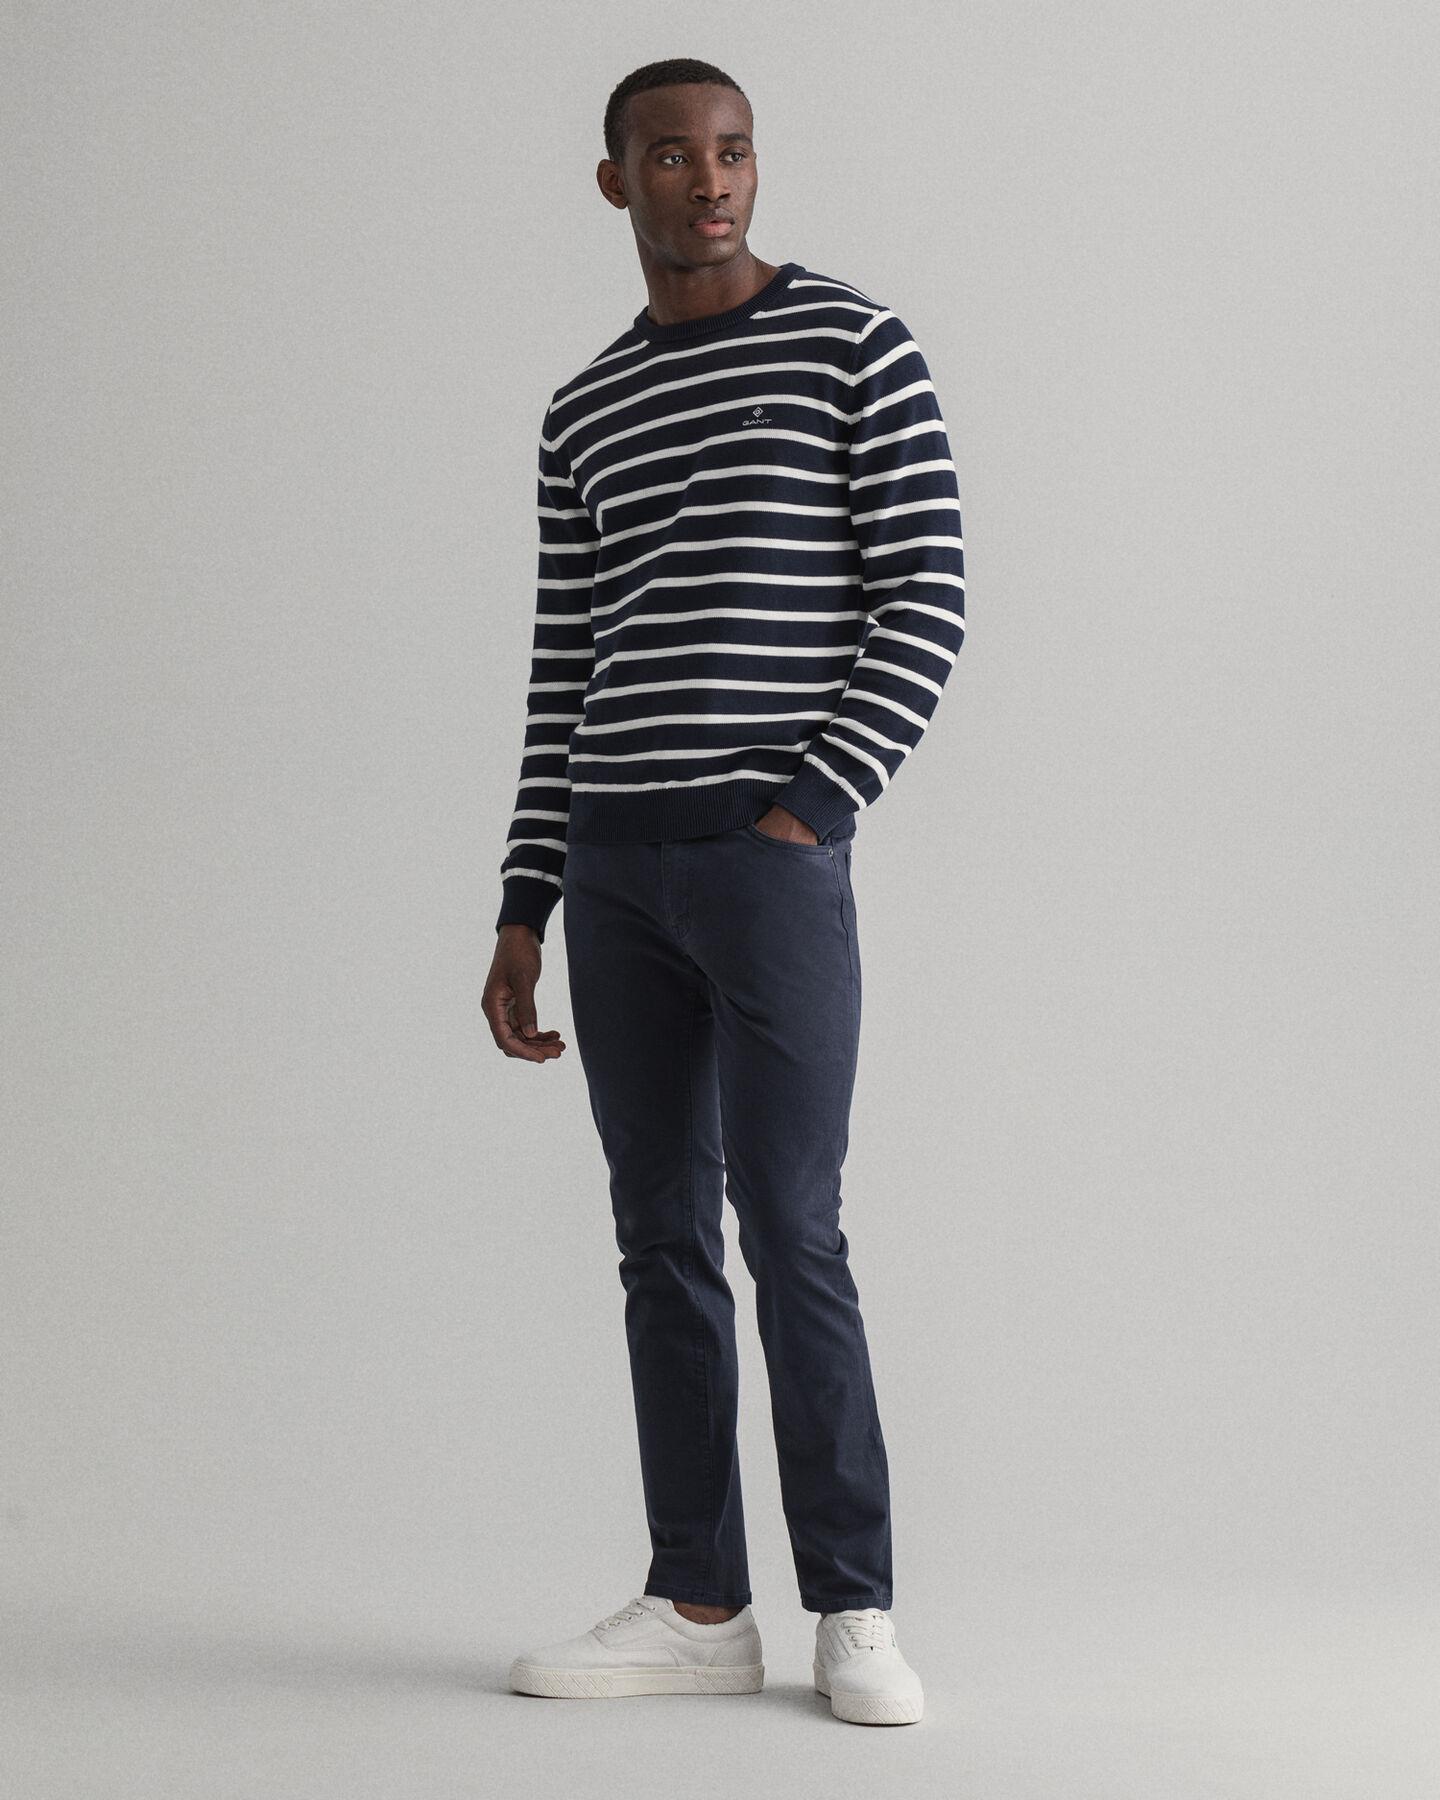 Hayes Desert jeans